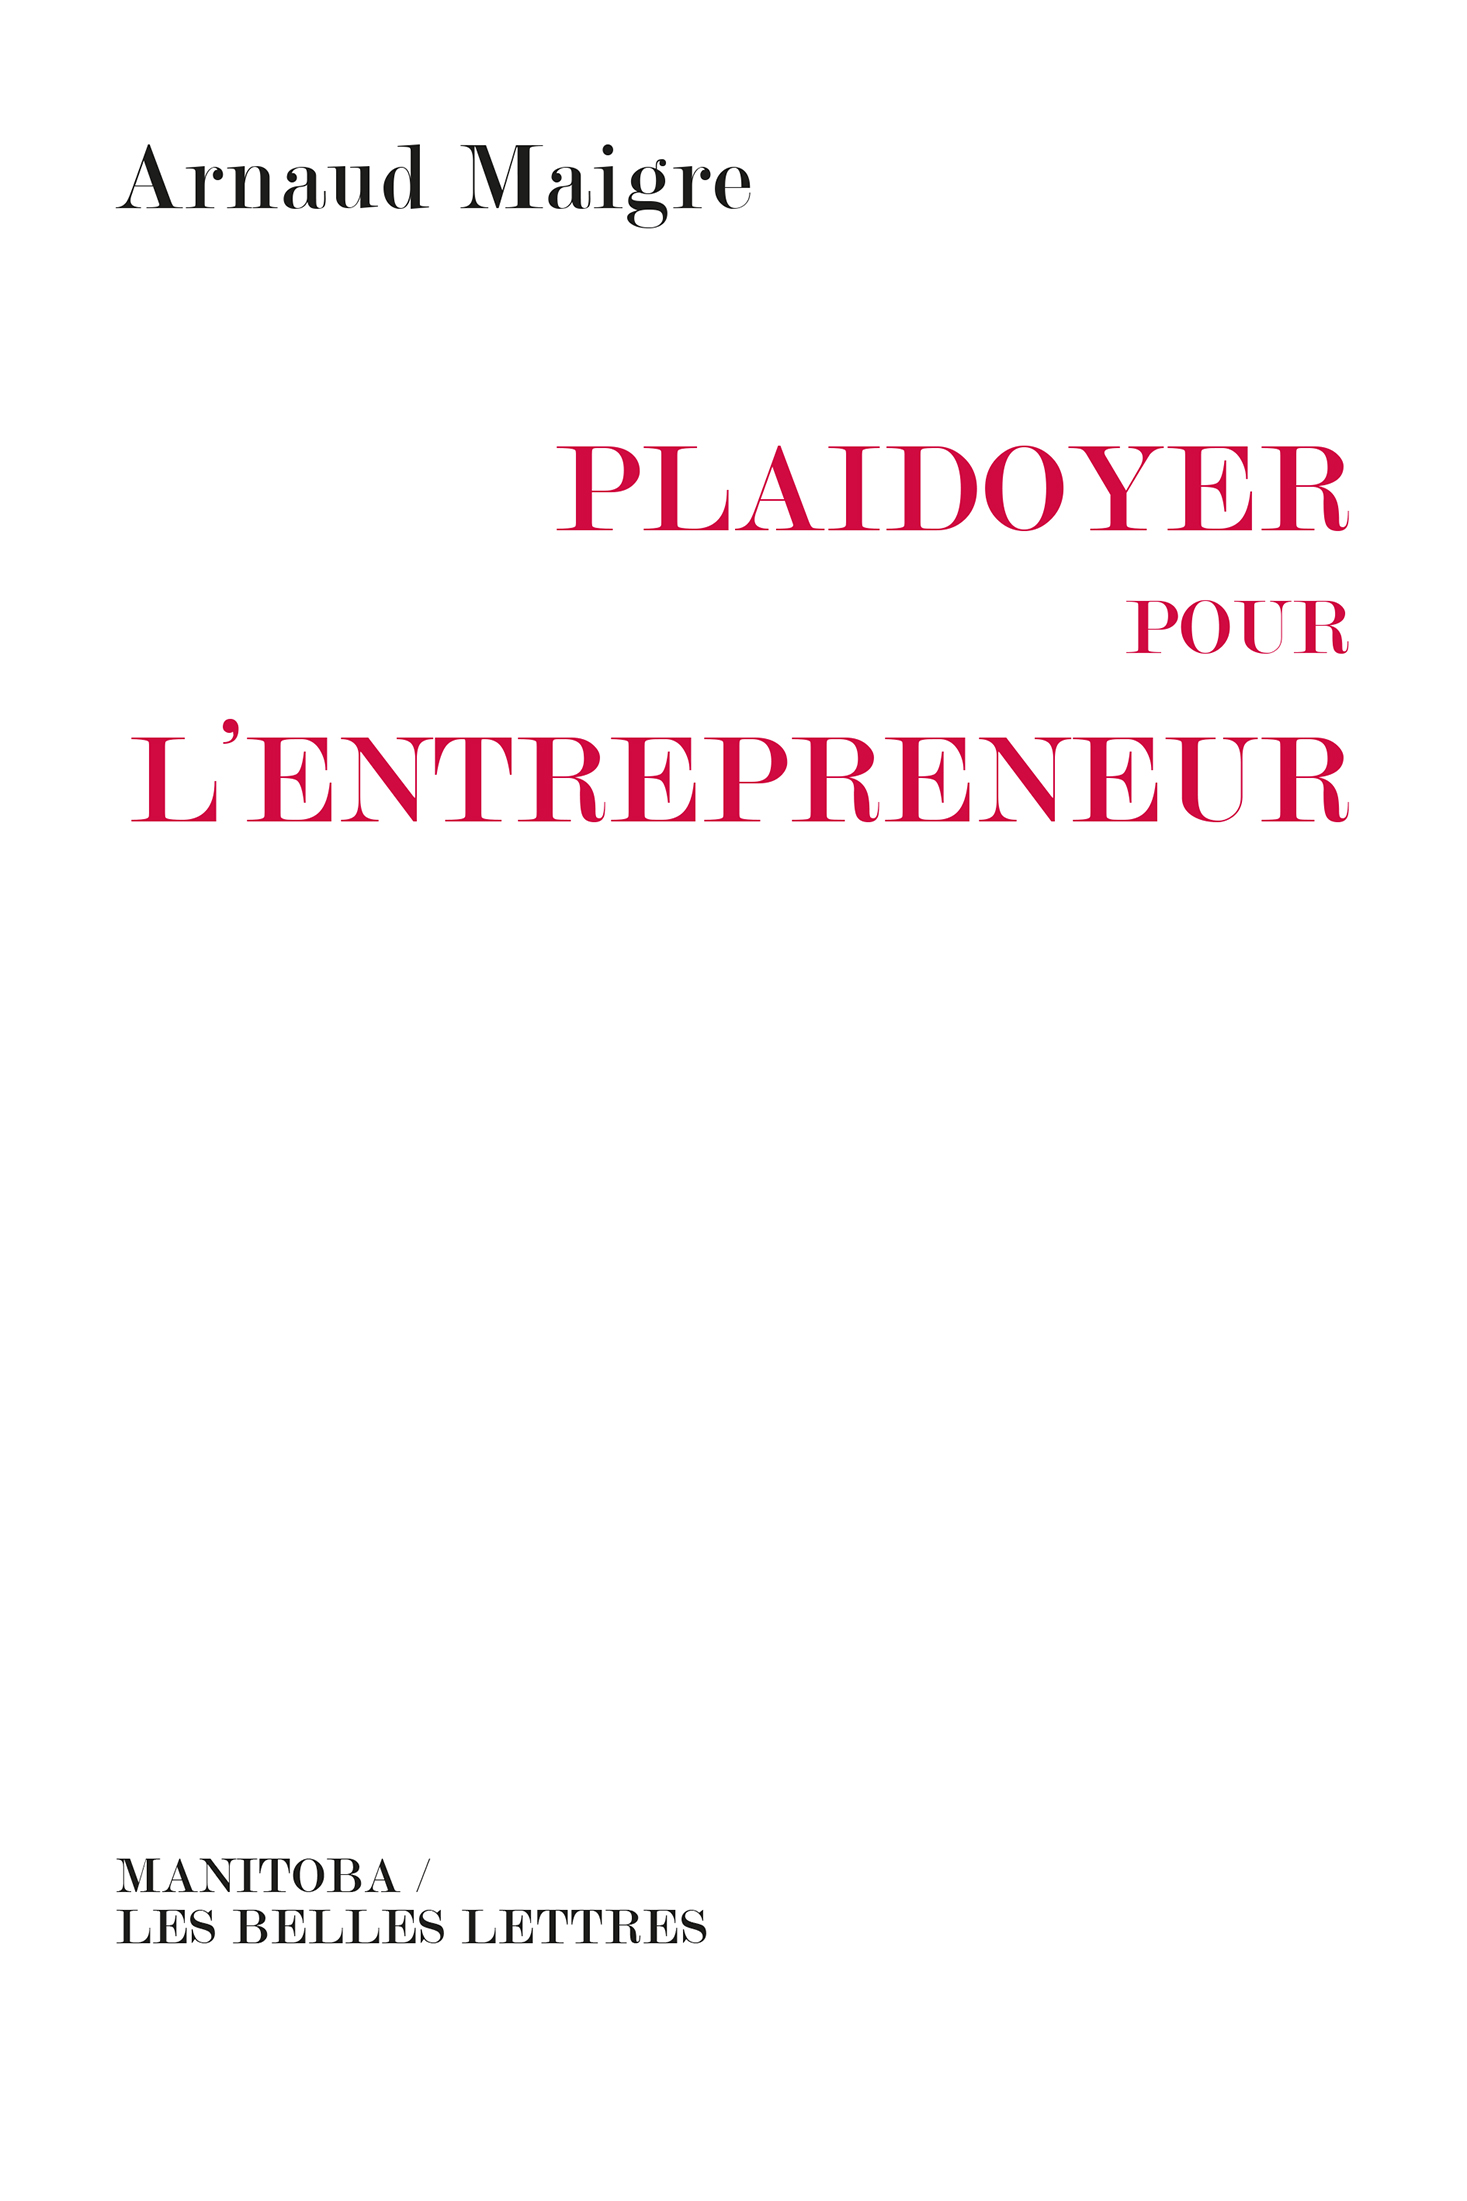 Plaidoyer pour l'entrepreneur